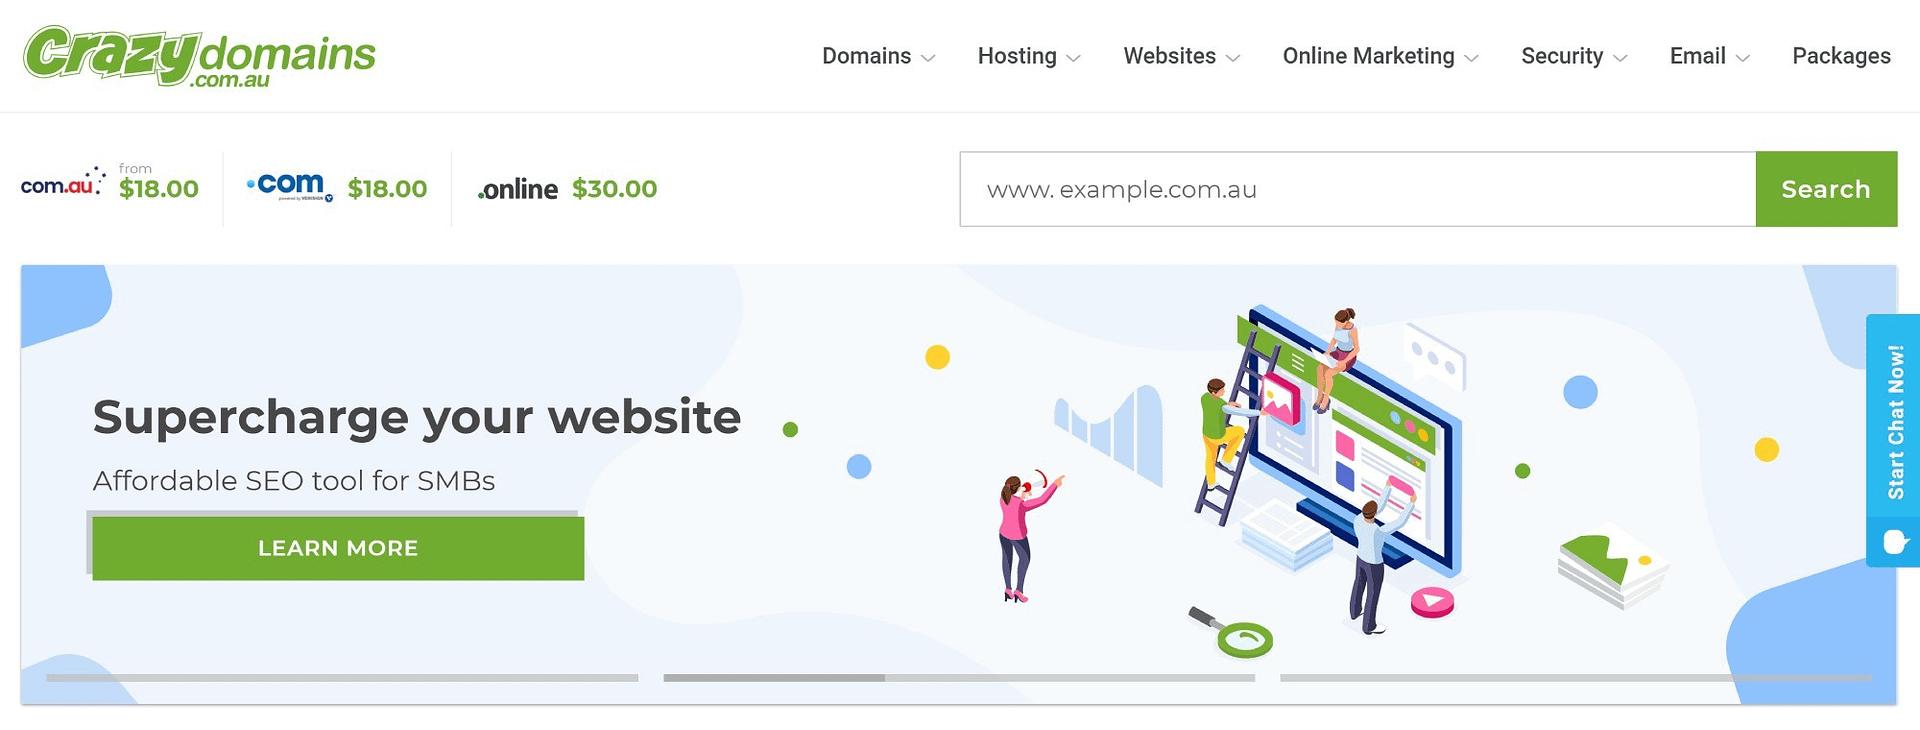 Best web hosting Australia: CrazyDomains